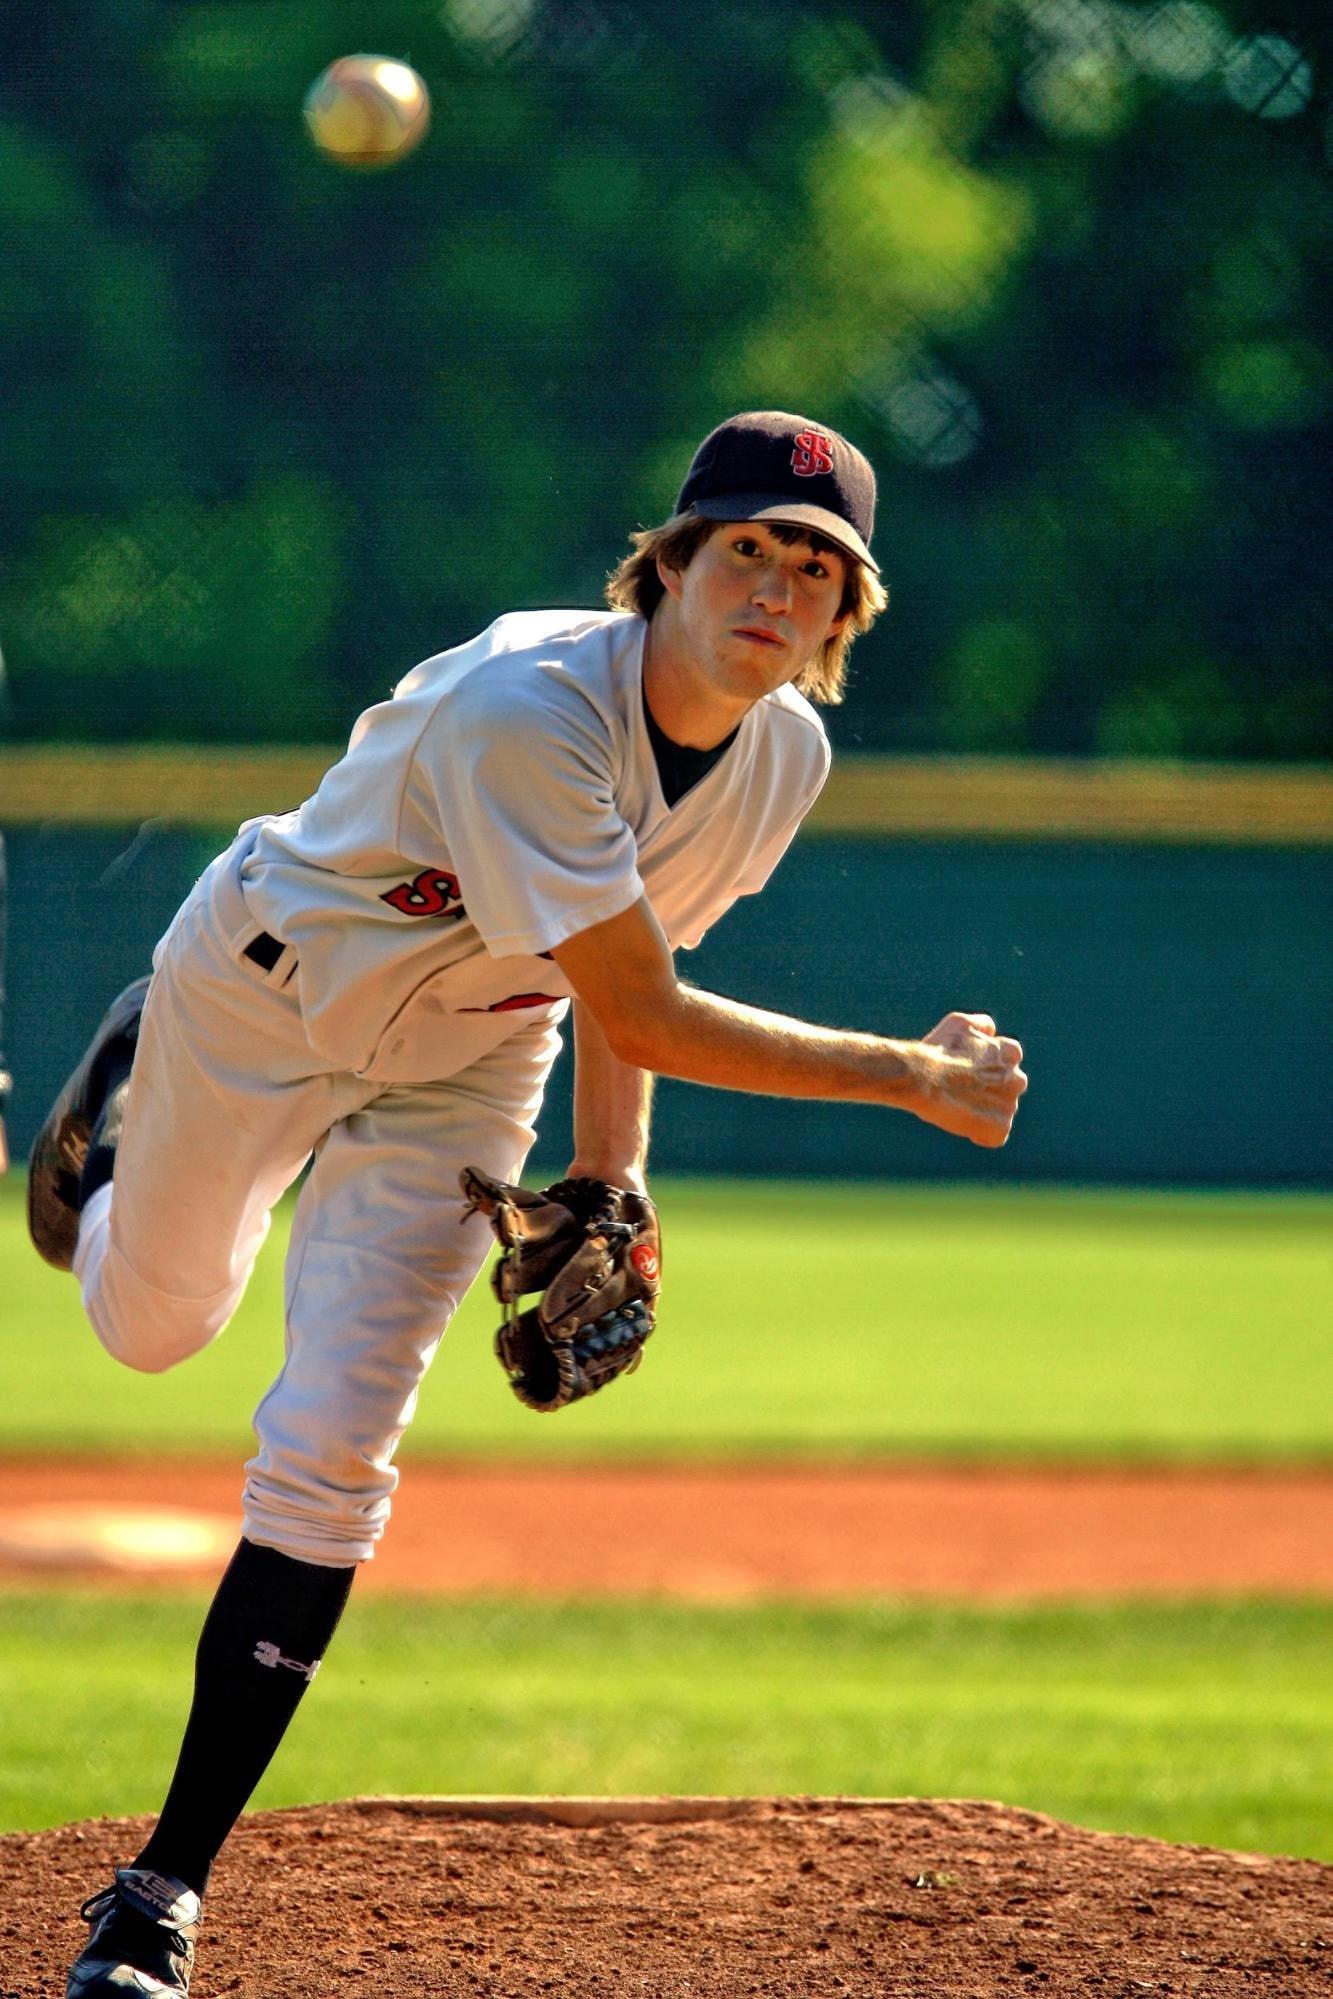 sports-photography-keith-johnson